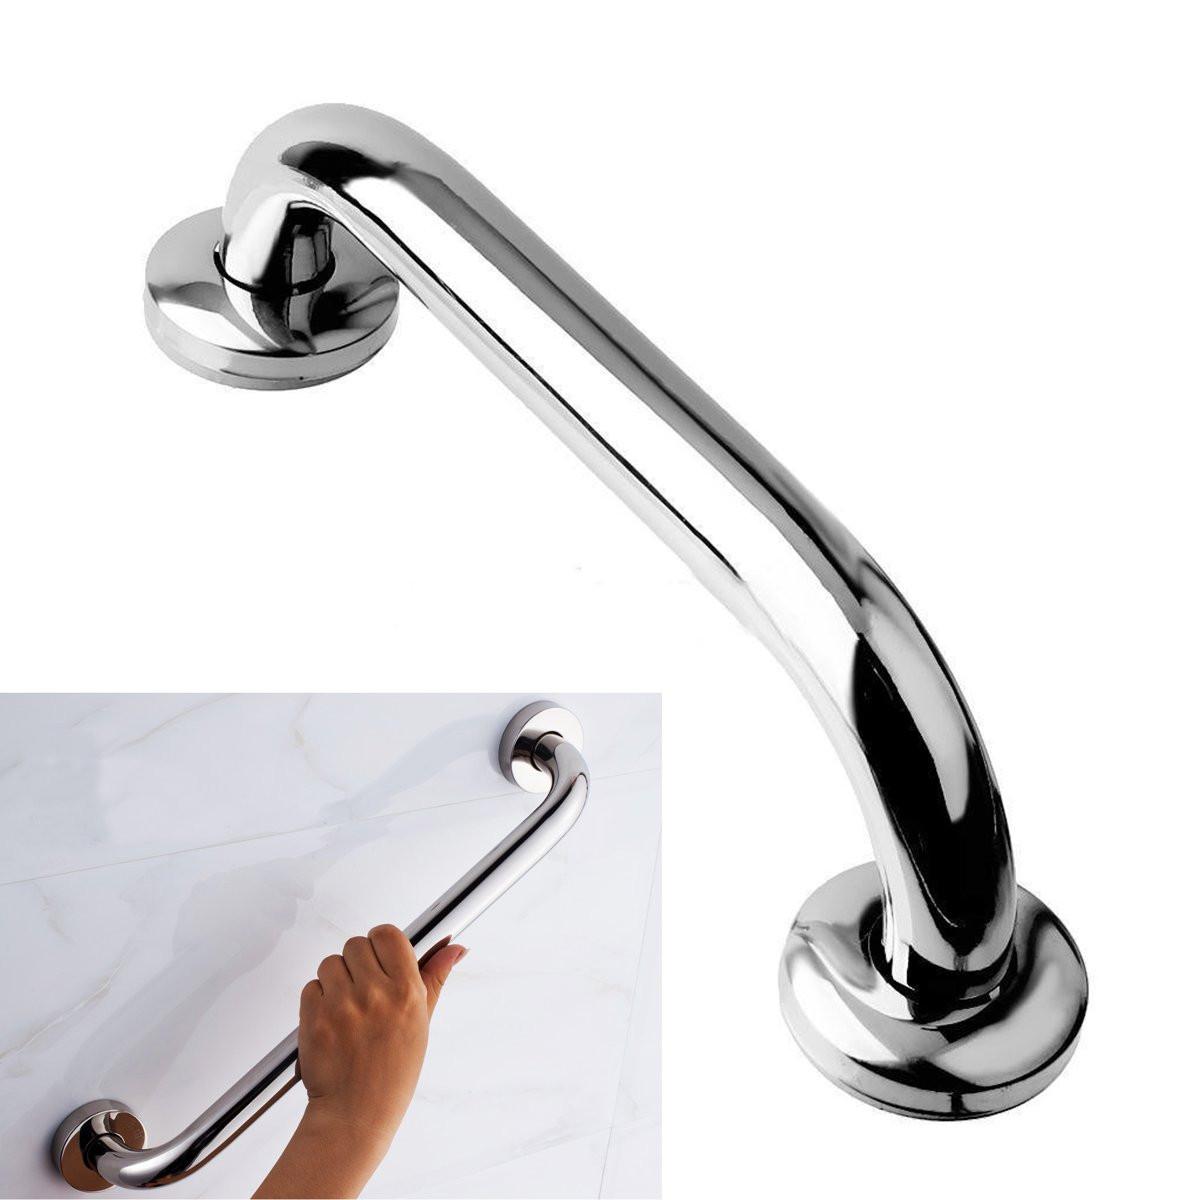 Stainless Steel Grab Bar Handle Chrome Bathroom Shower Tub Handgrip 25CM